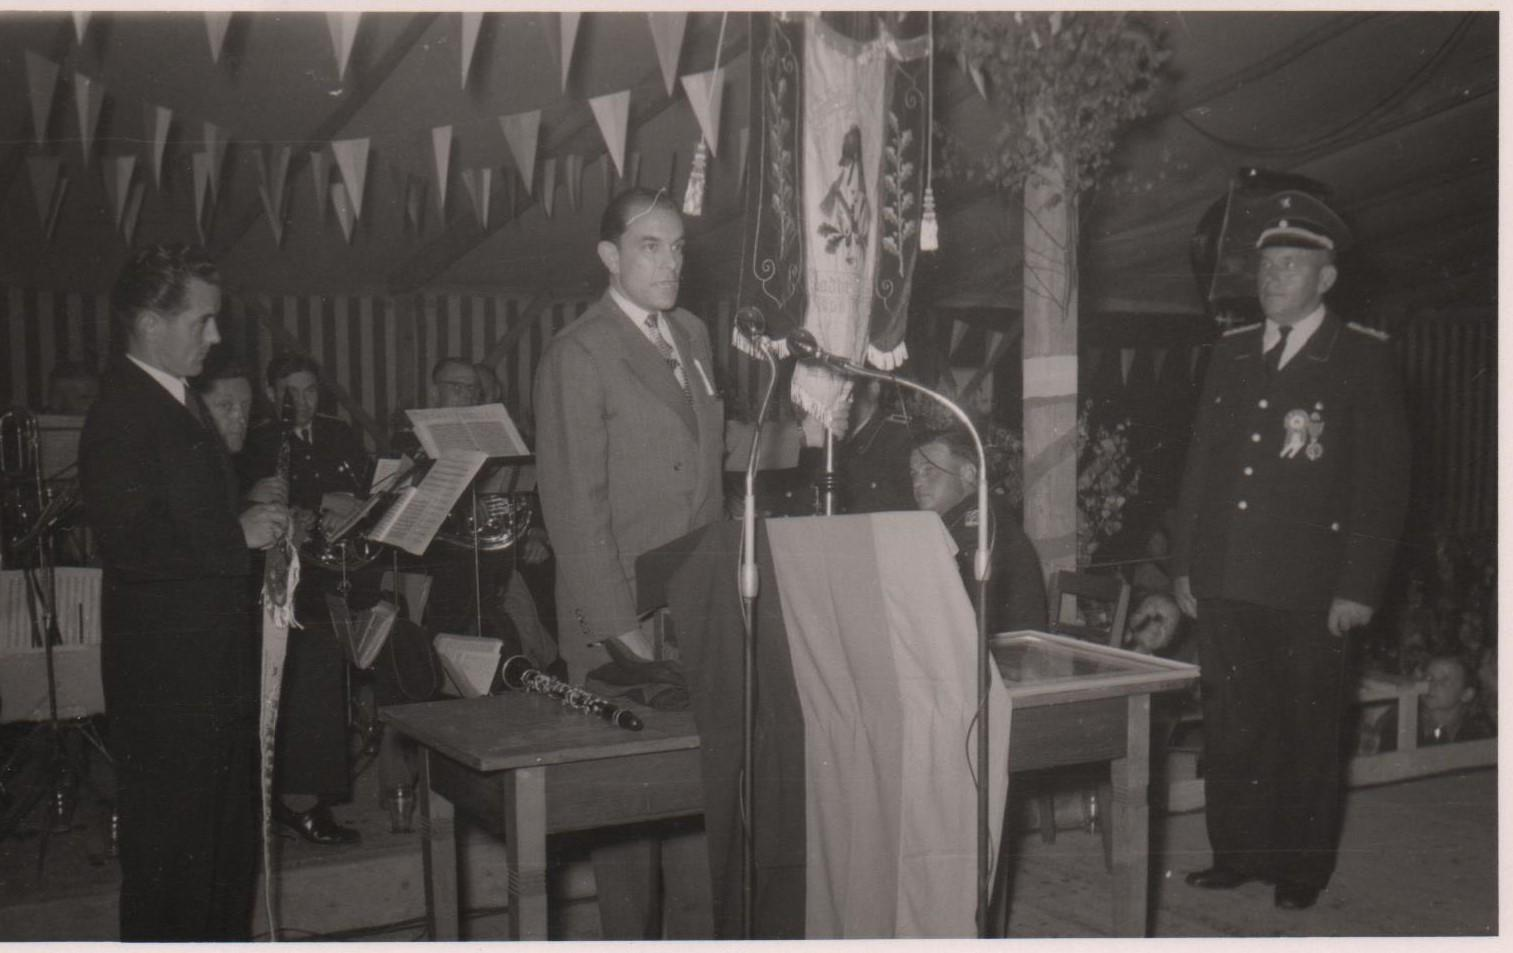 Fahnenübergabe Dr. Walter Rumpf 1956